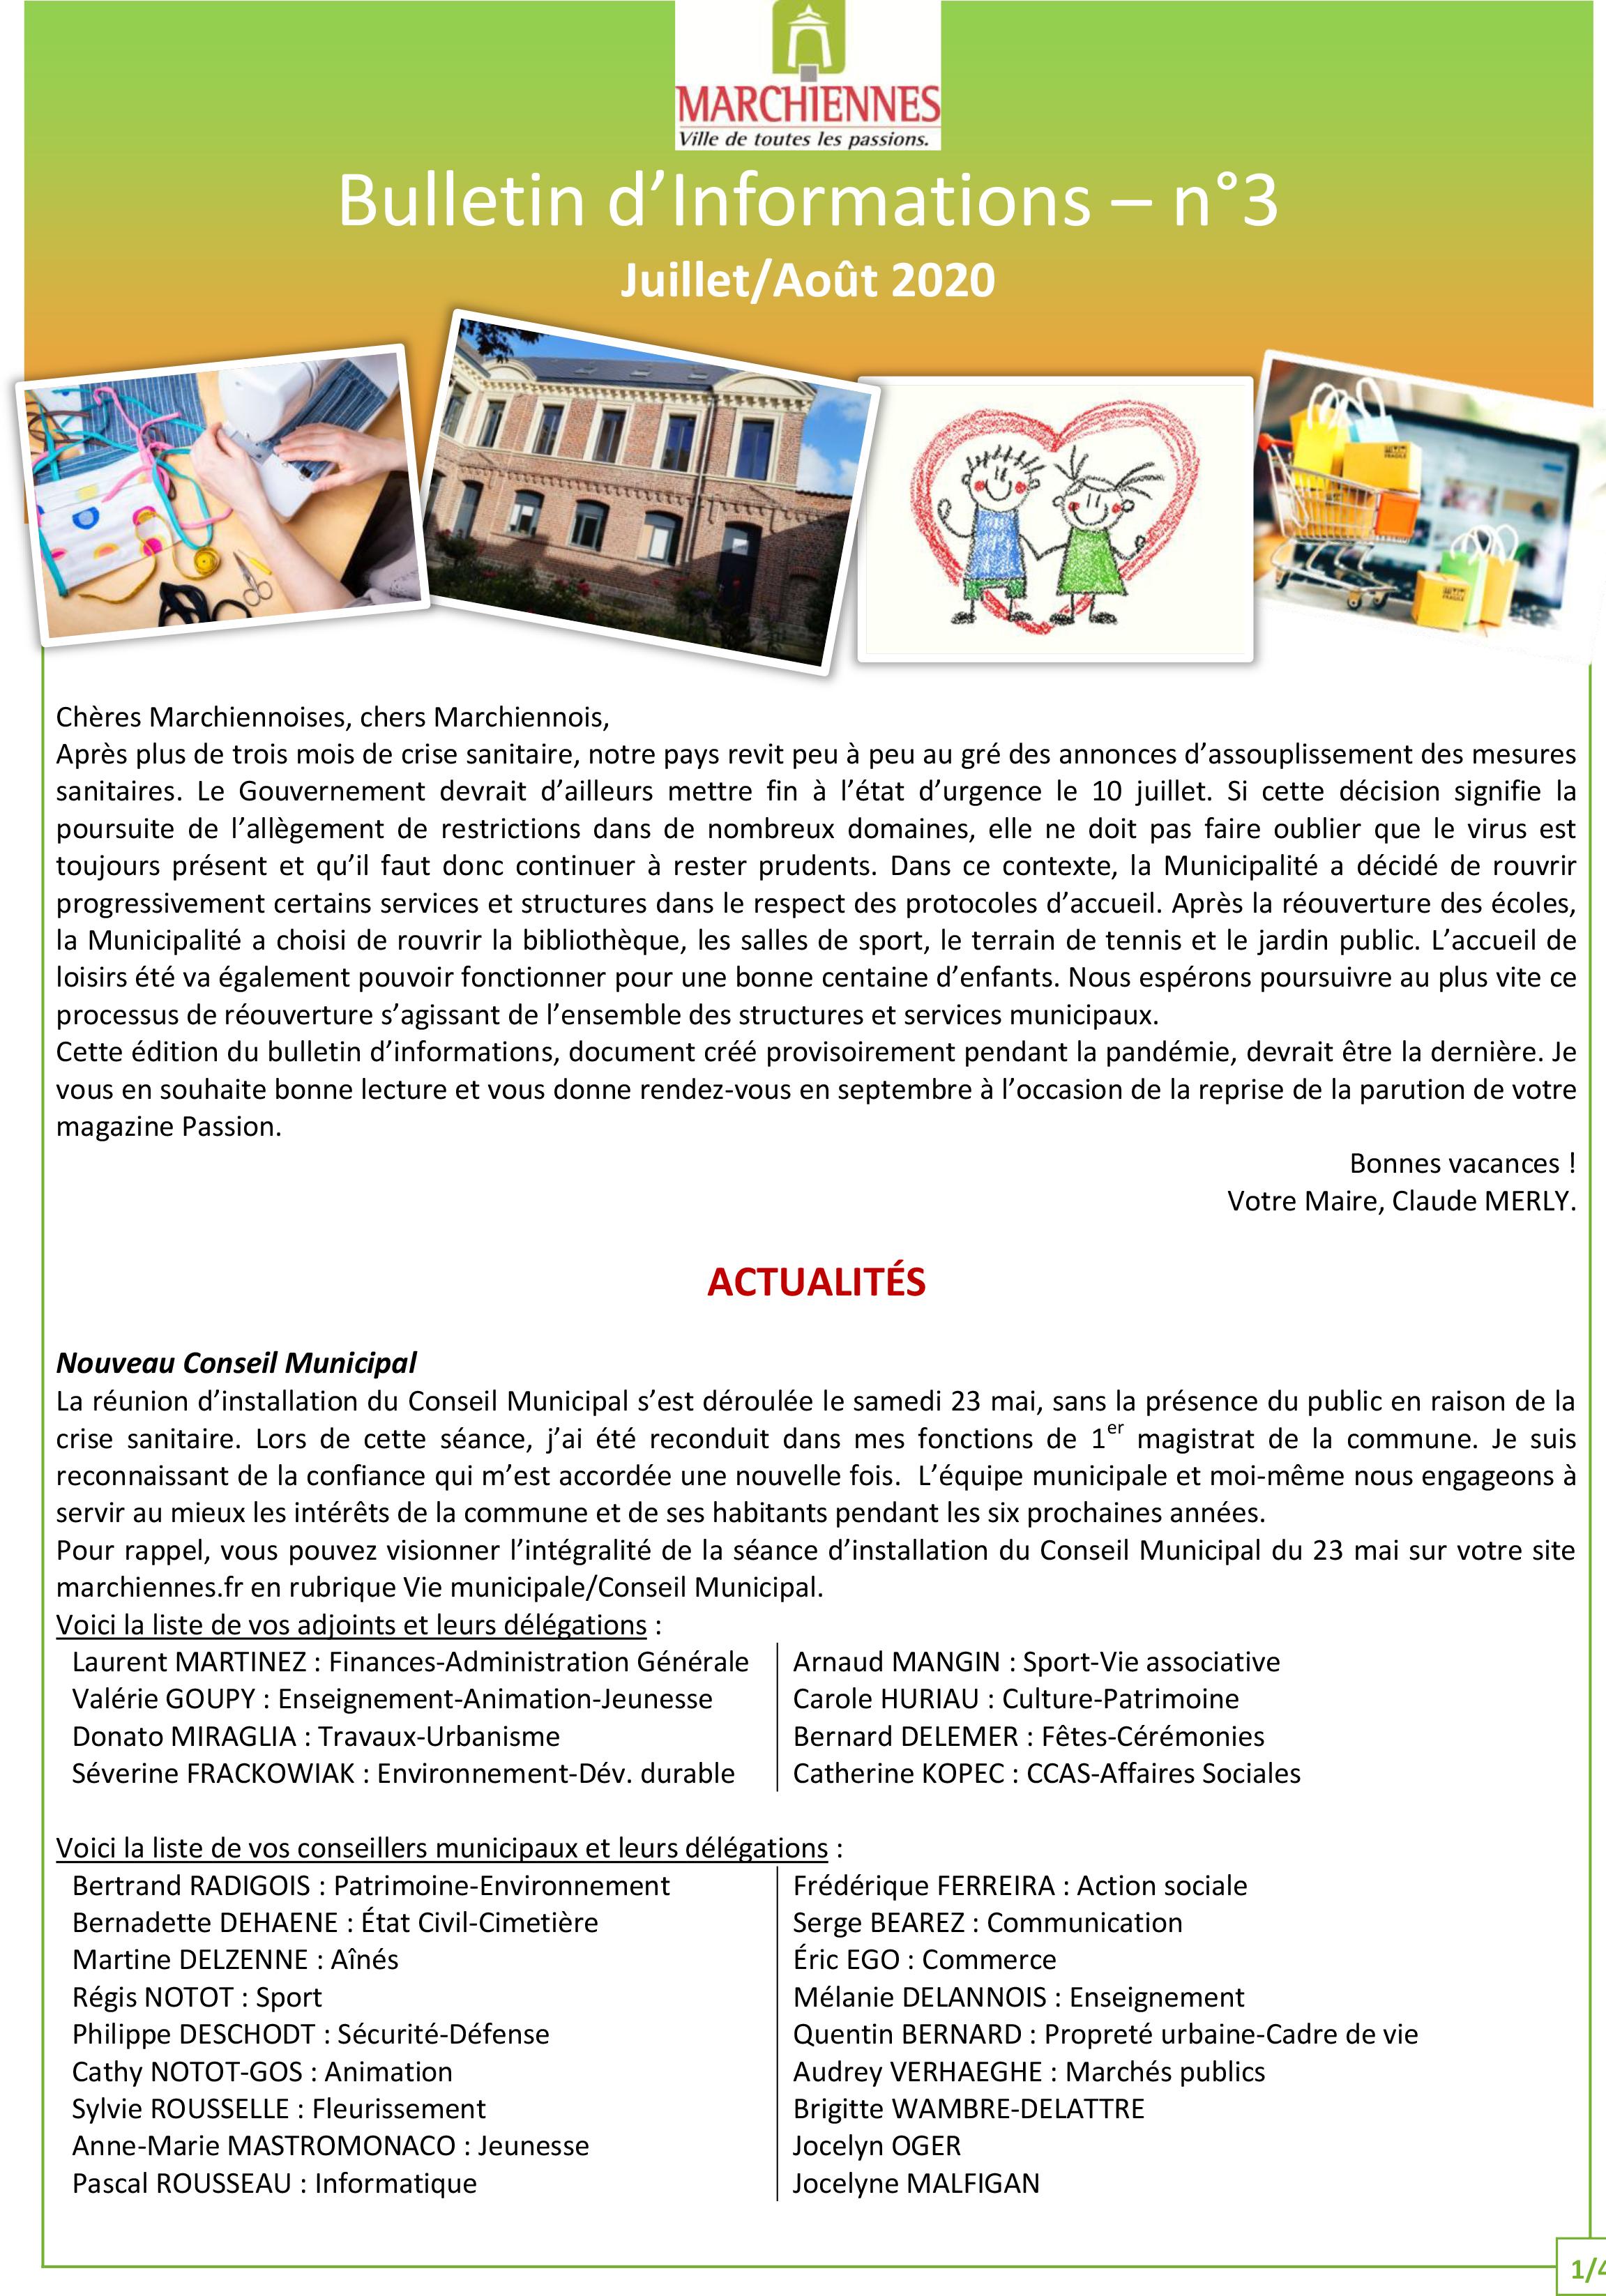 couv bulletin d'info n°3